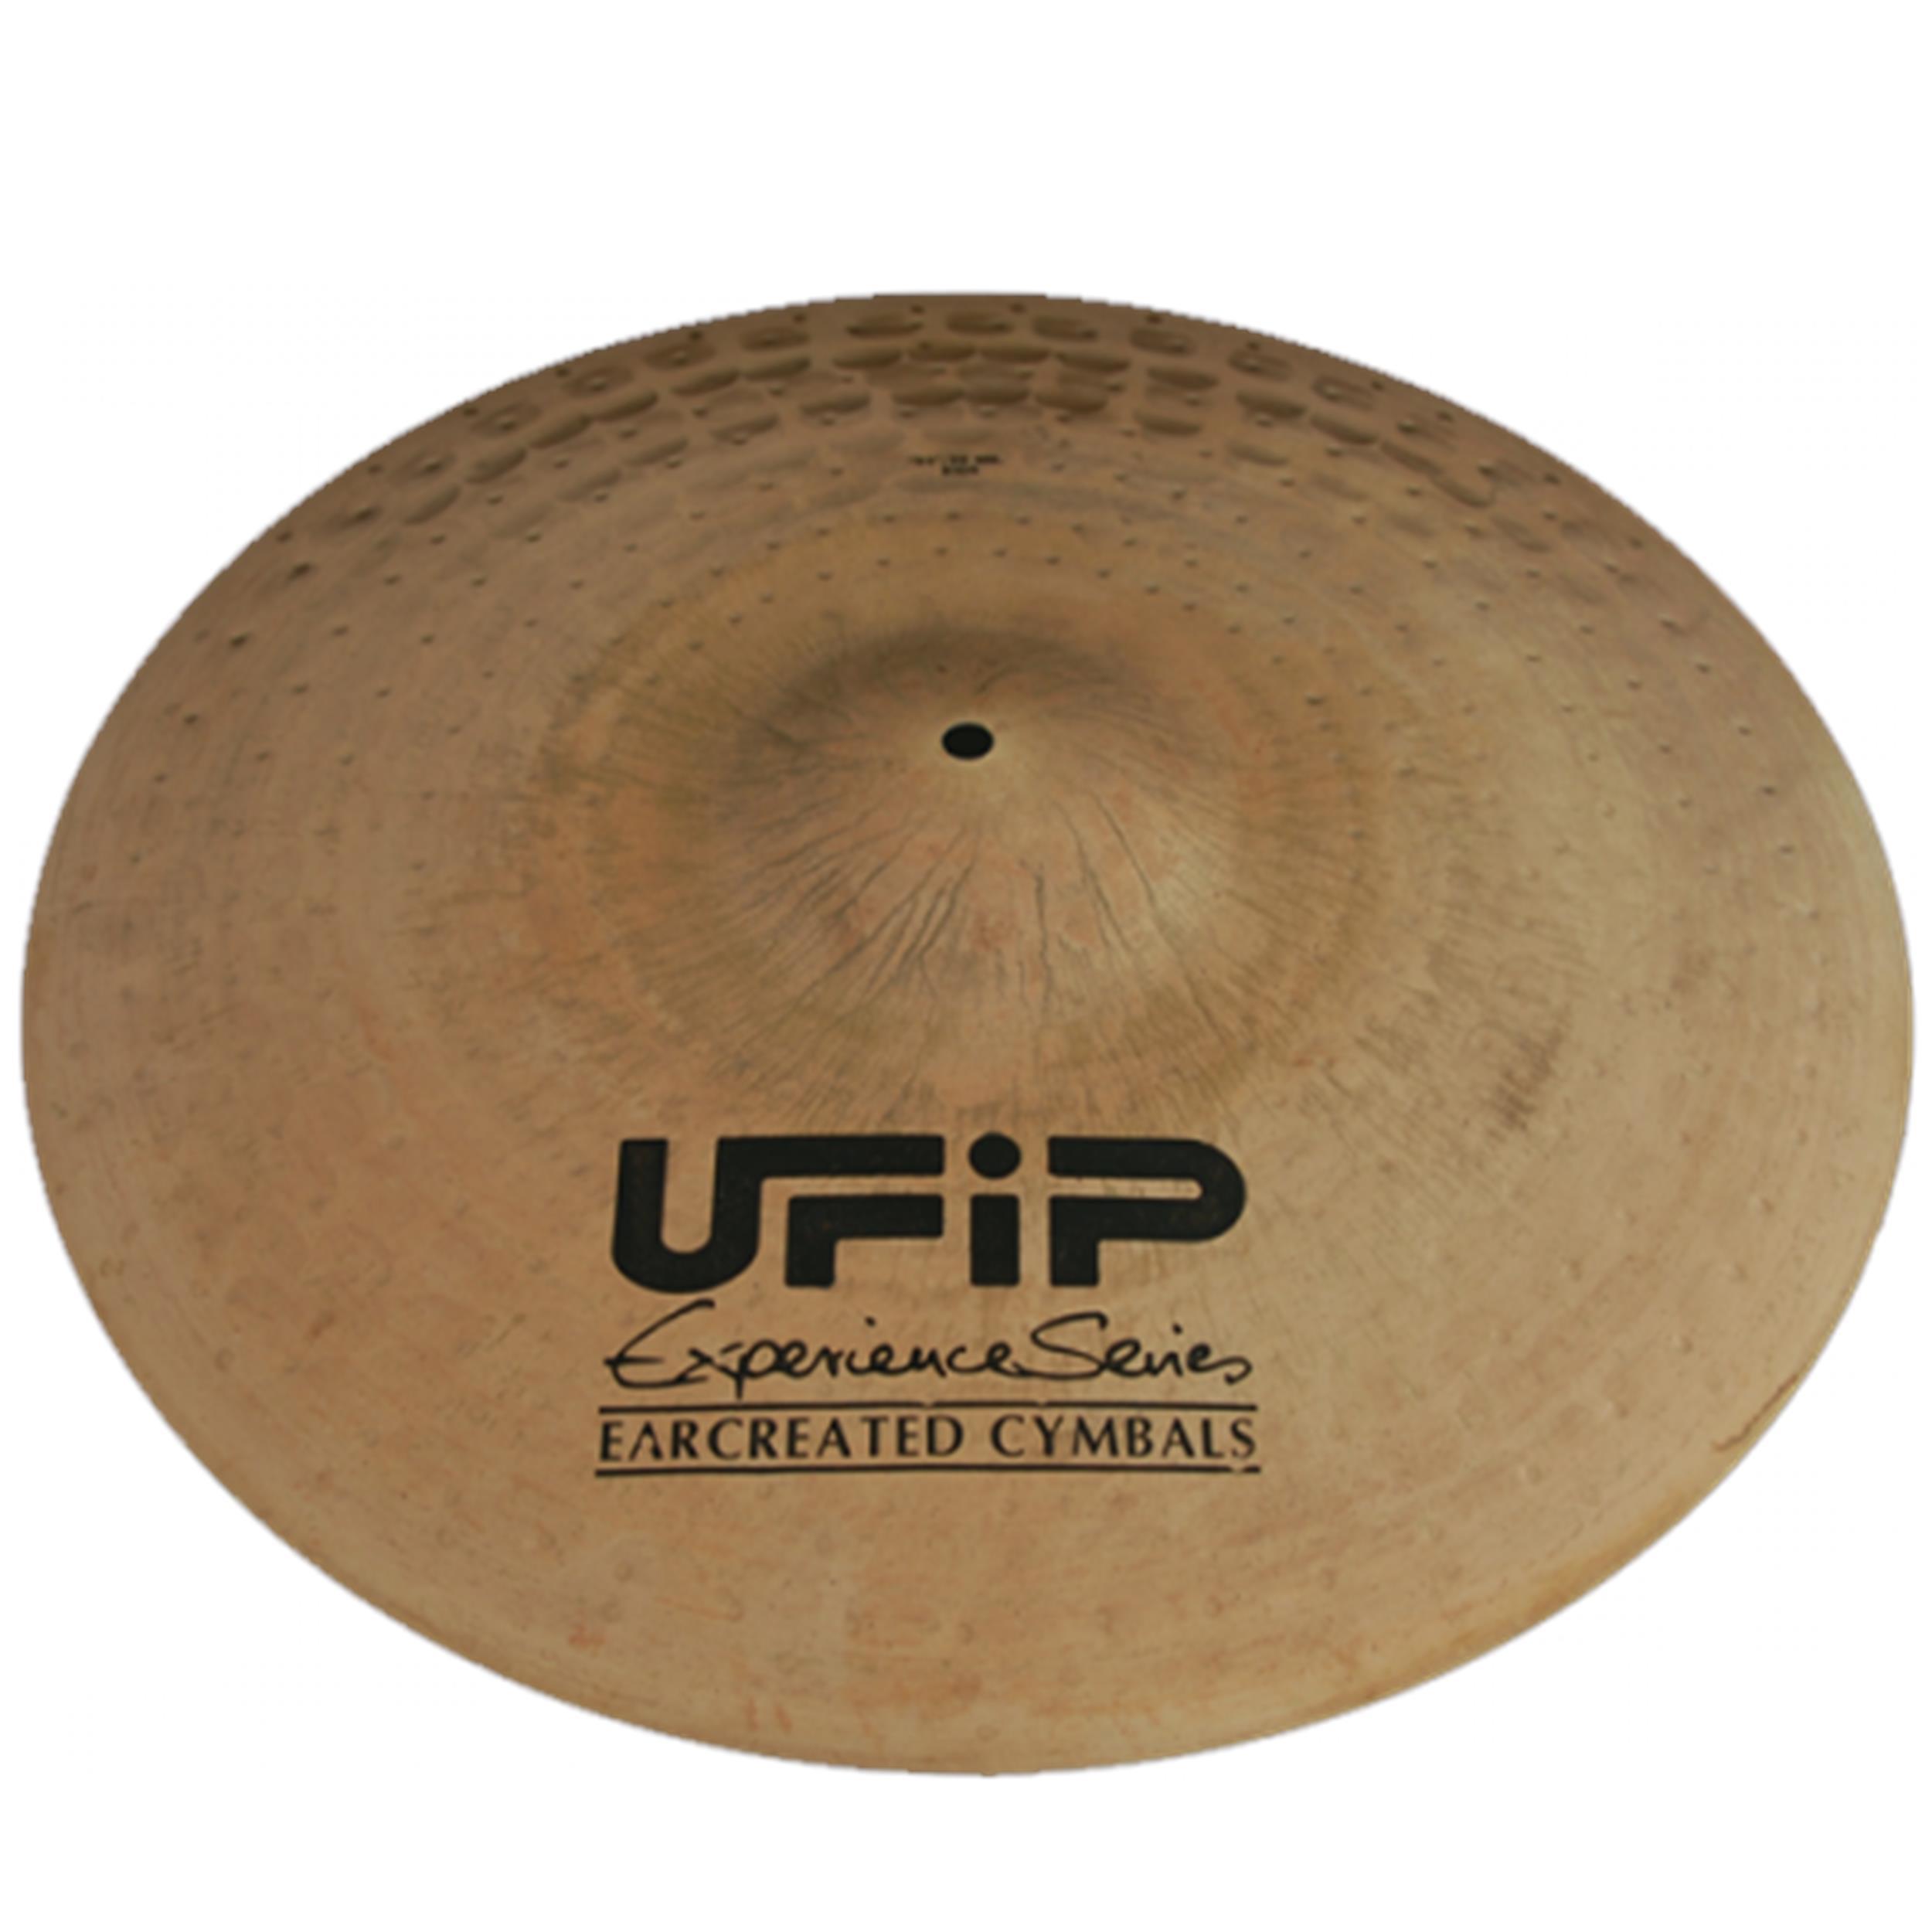 UFIP ES-21CRN - Experience Series 21